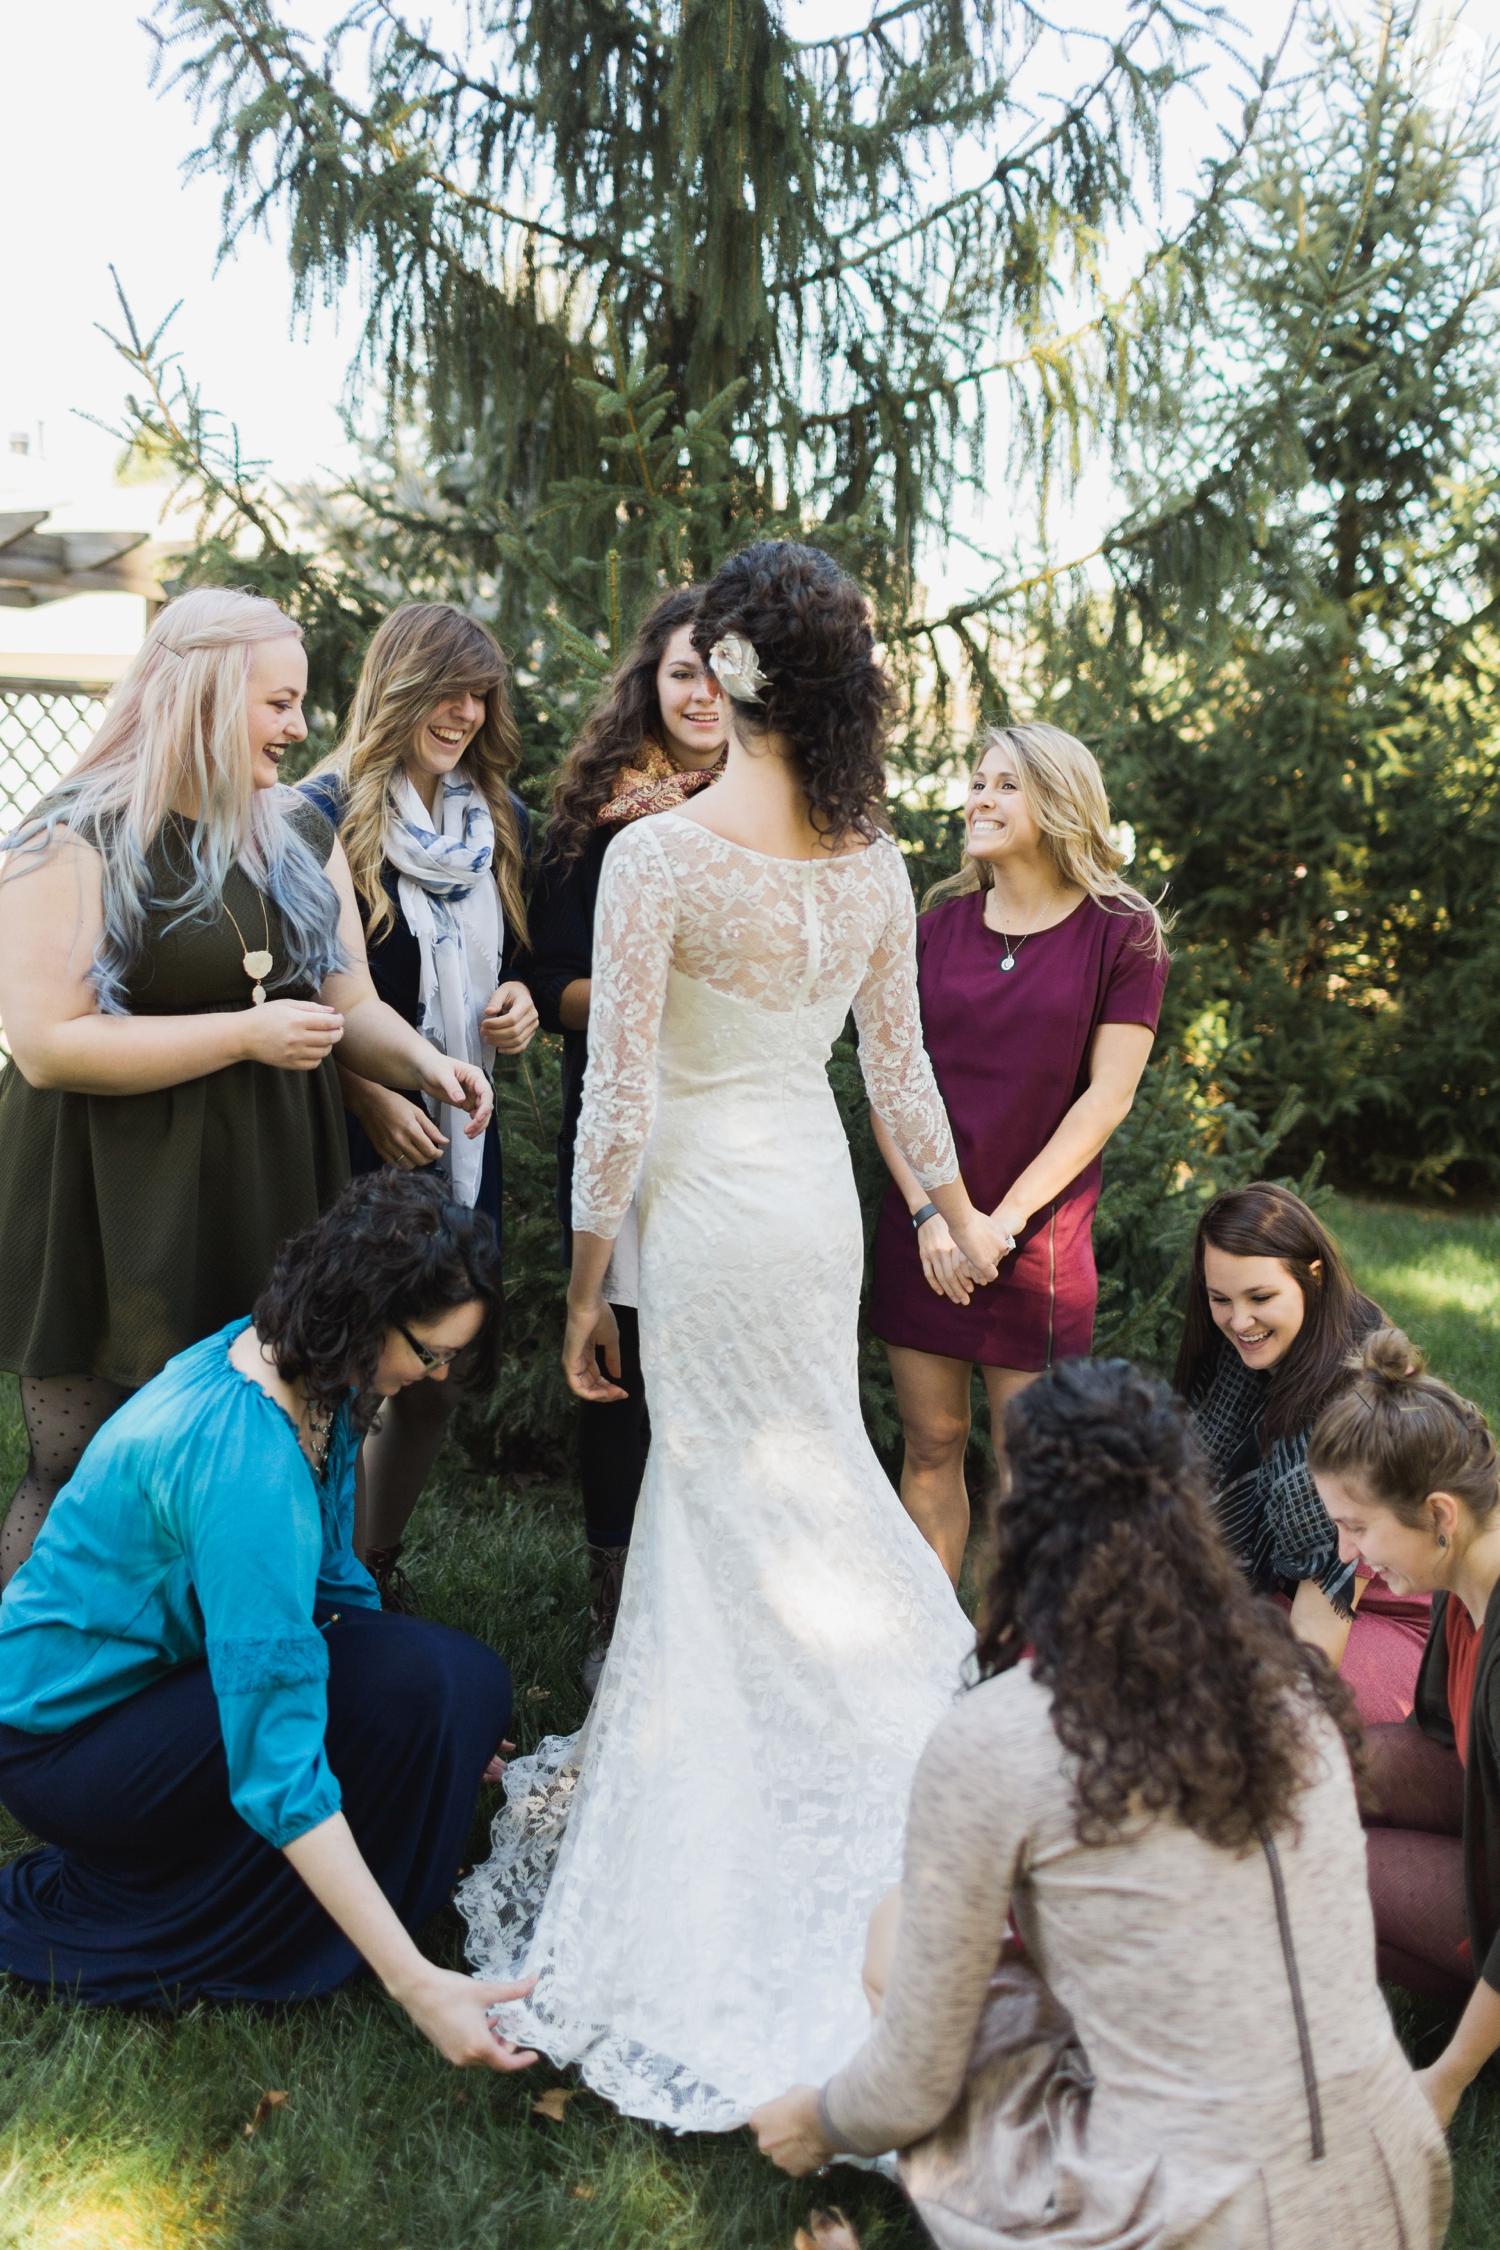 Outdoor-Wedding-in-the-Woods-Photography_4172.jpg